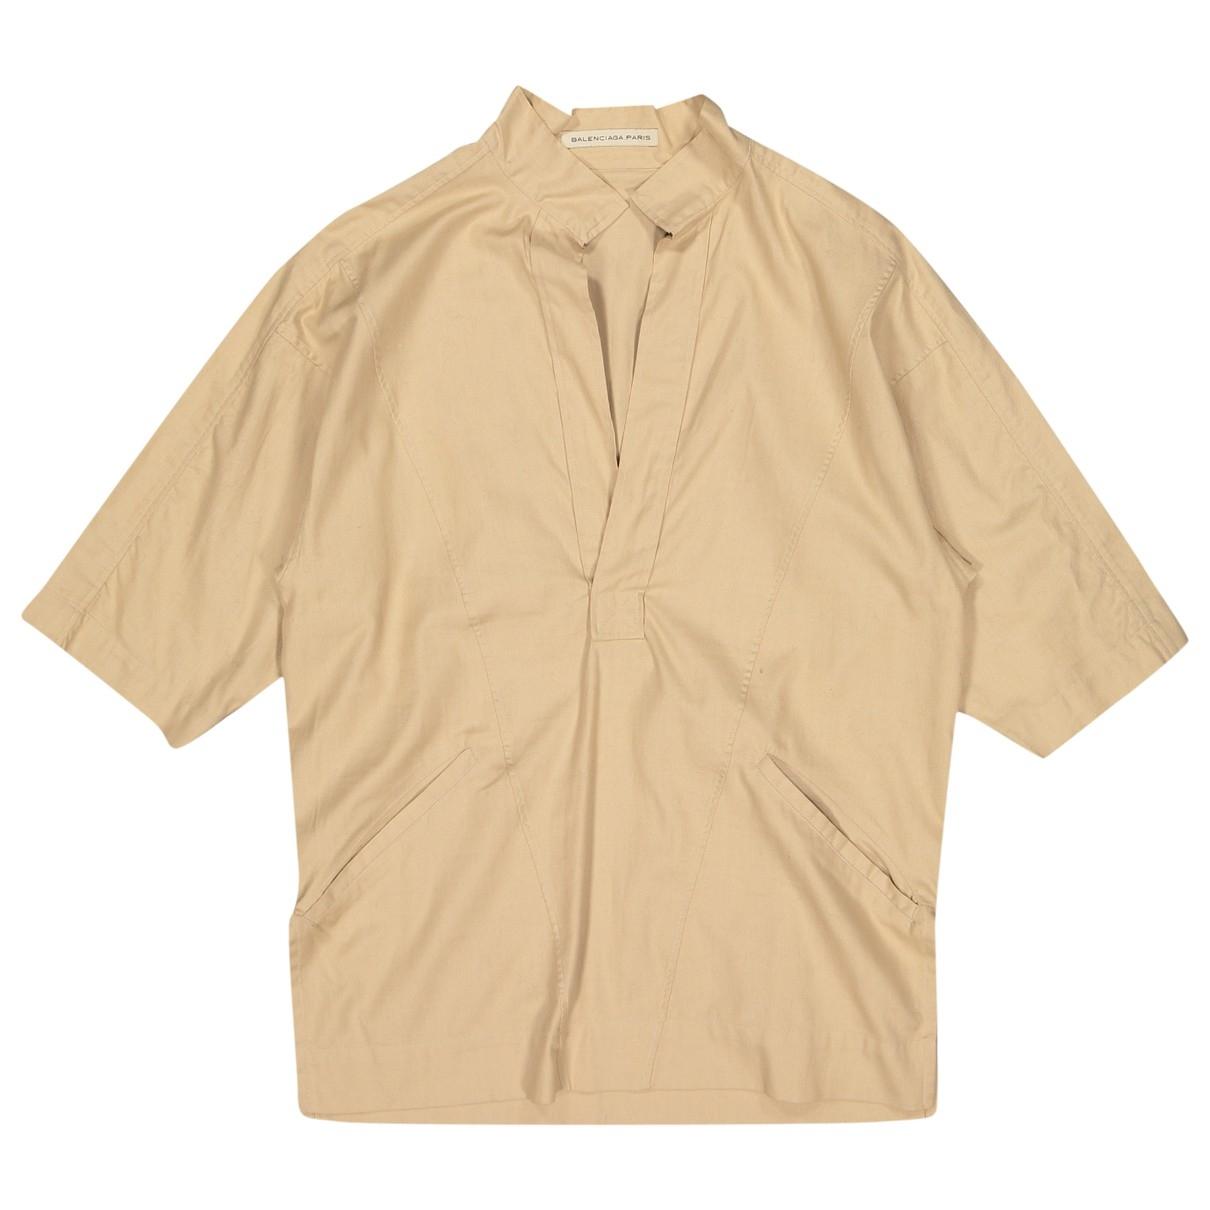 Balenciaga \N Beige Cotton  top for Women S International